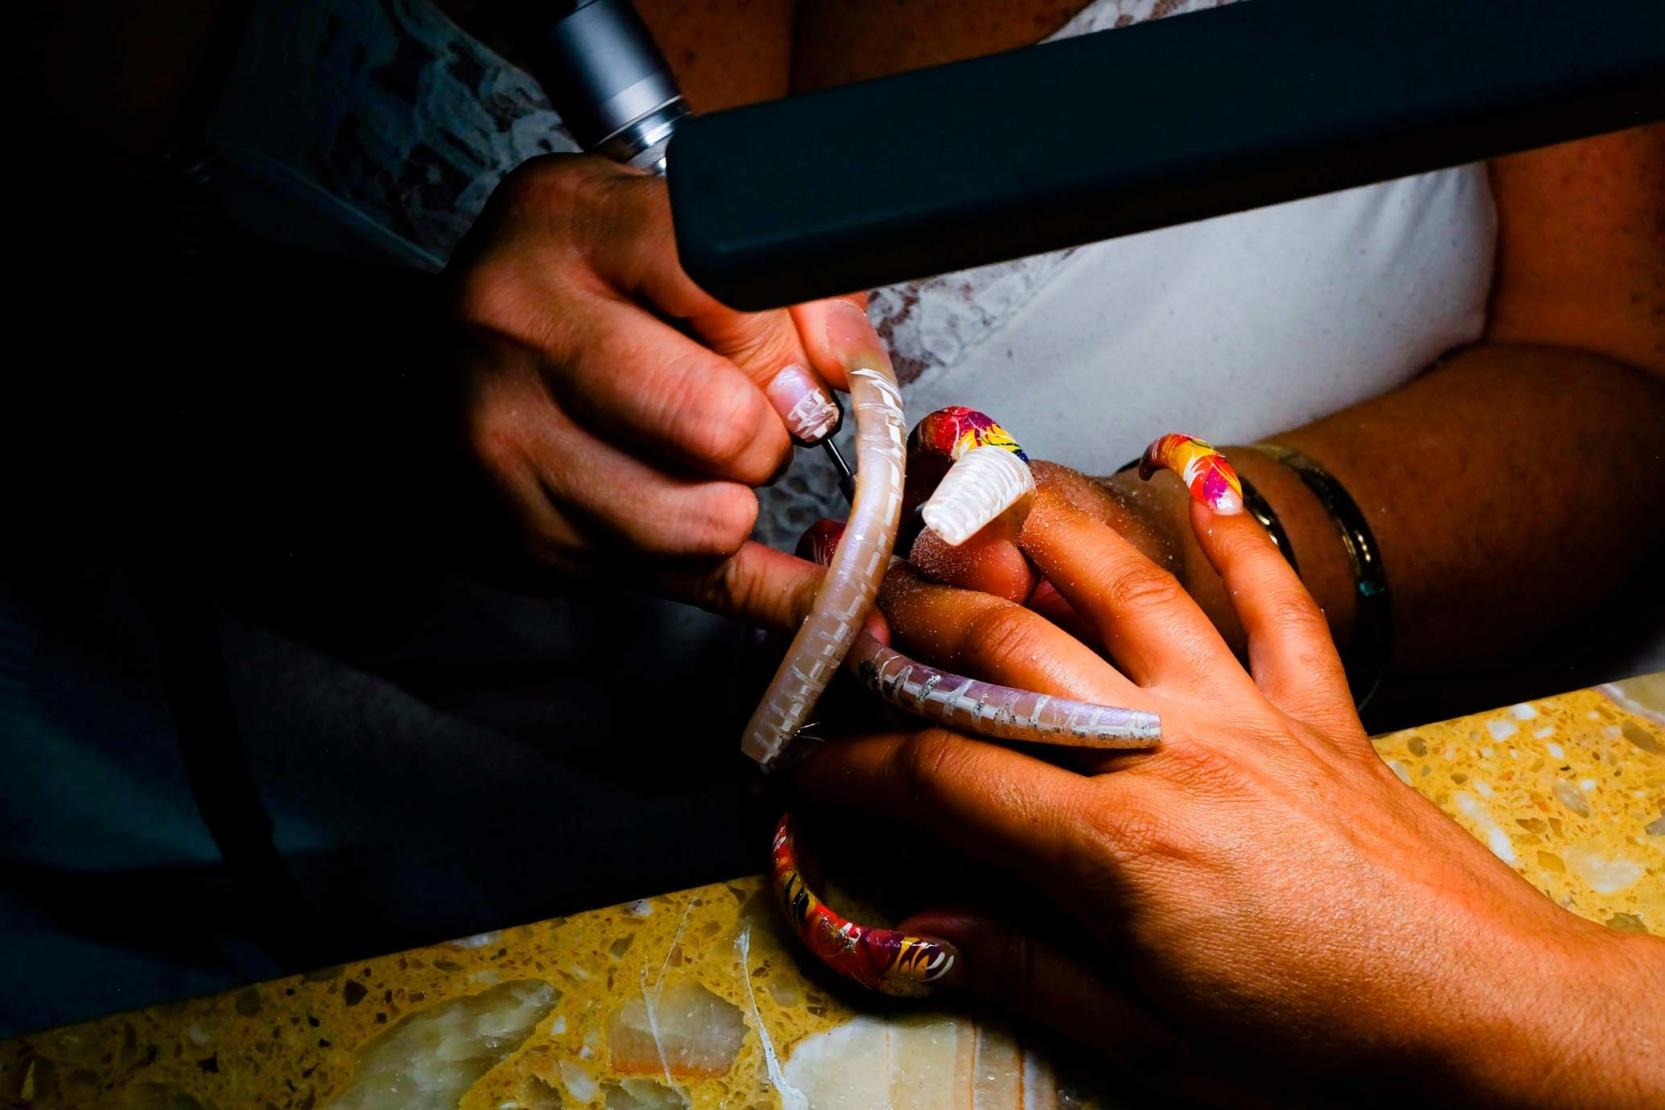 Maria filling in Debbie Warren's nails